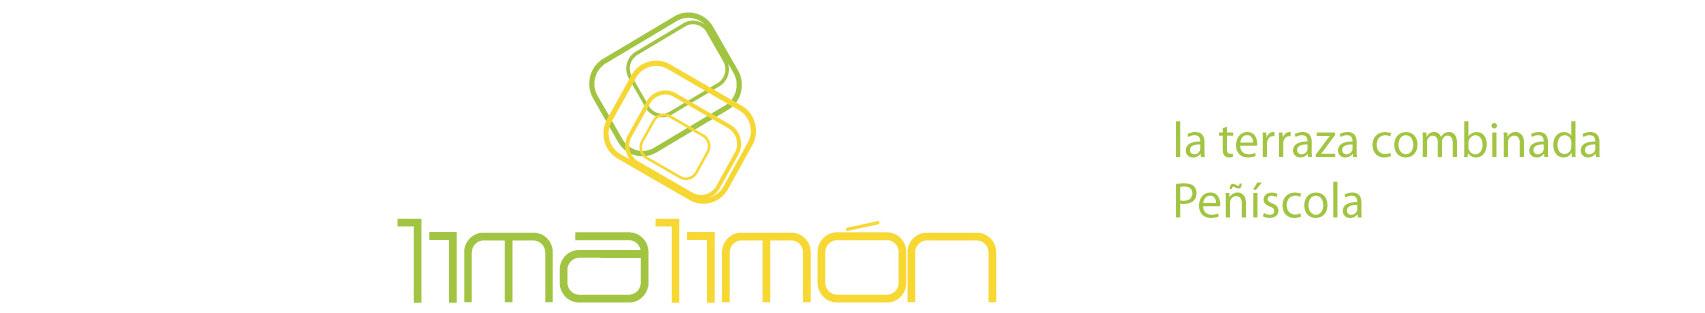 lima-limon-peniscola